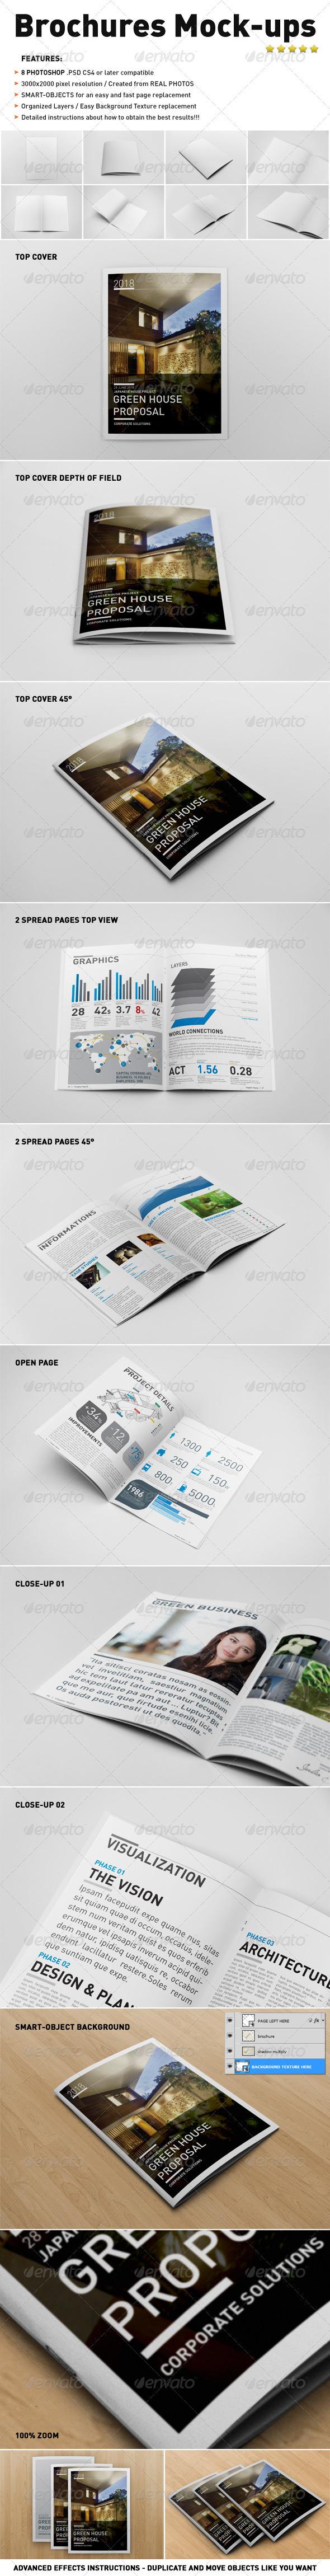 Photorealistic Brochure Mock-ups - Brochures Print